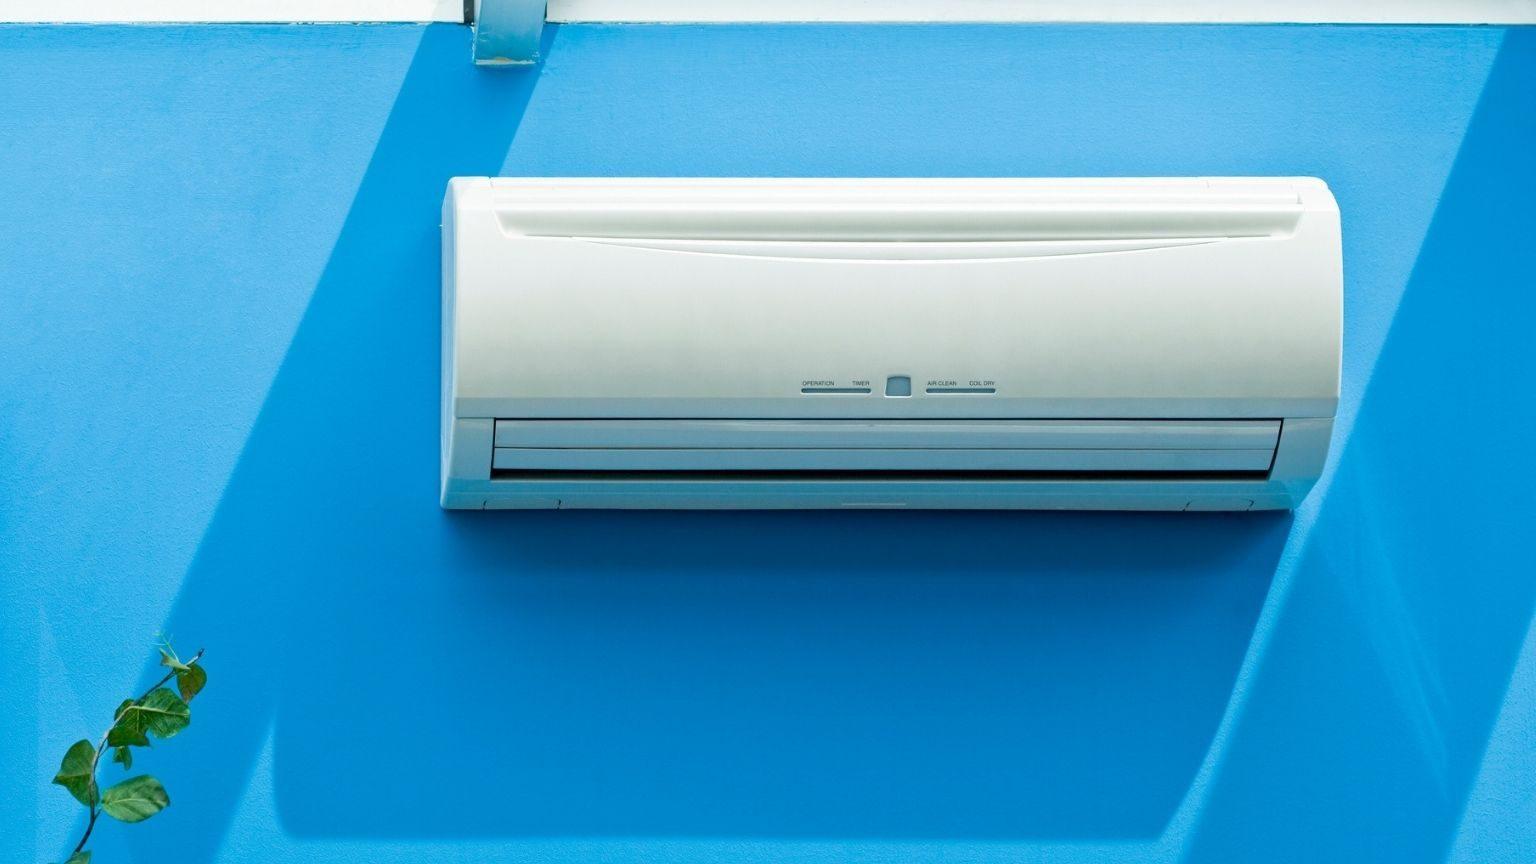 Split Type Air Conditioner on blue background